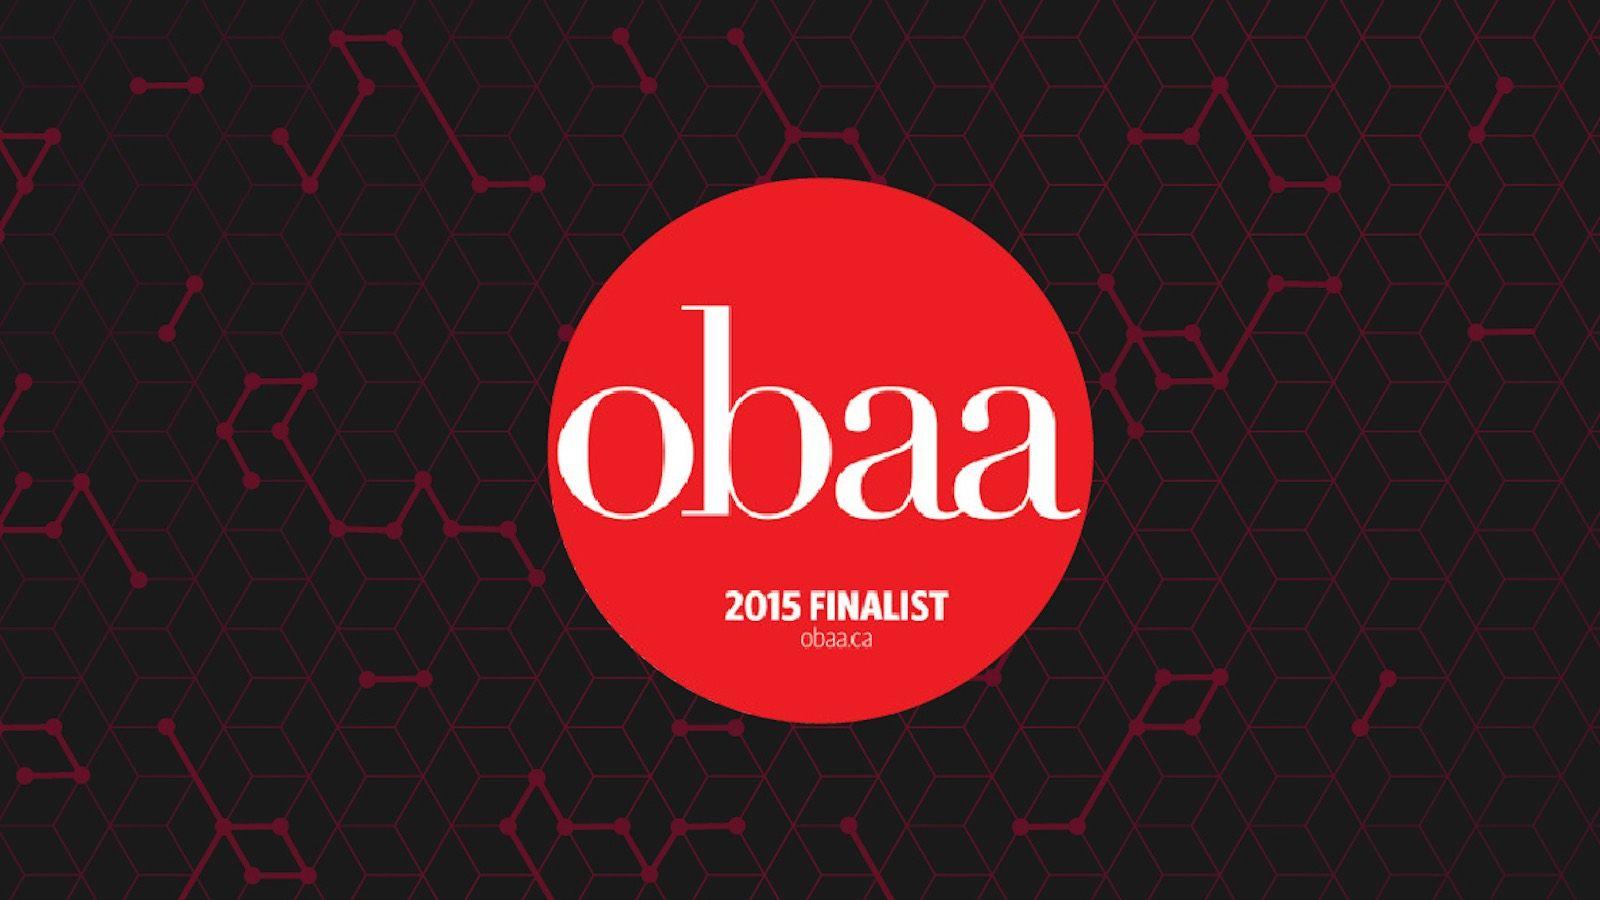 obaa 2015 finalist logo on black background